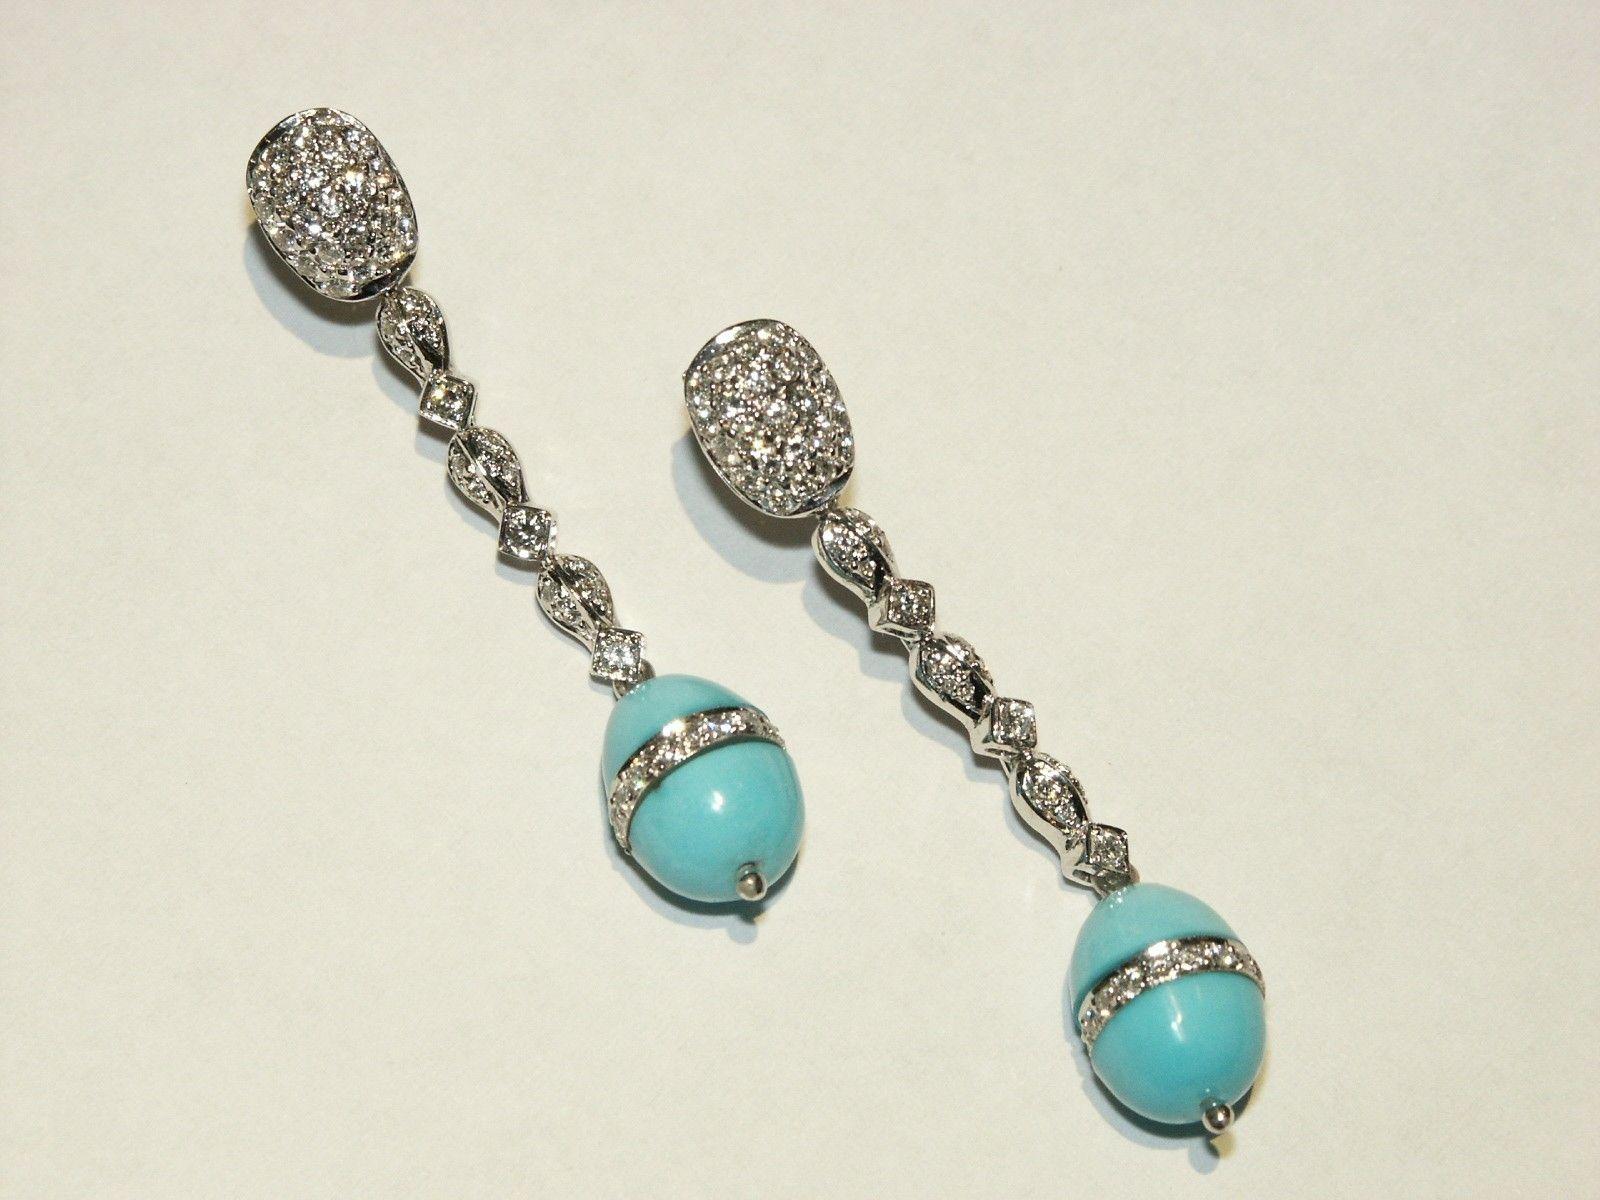 Custom Made Diamond And Custom Cut Turquoise Earrings